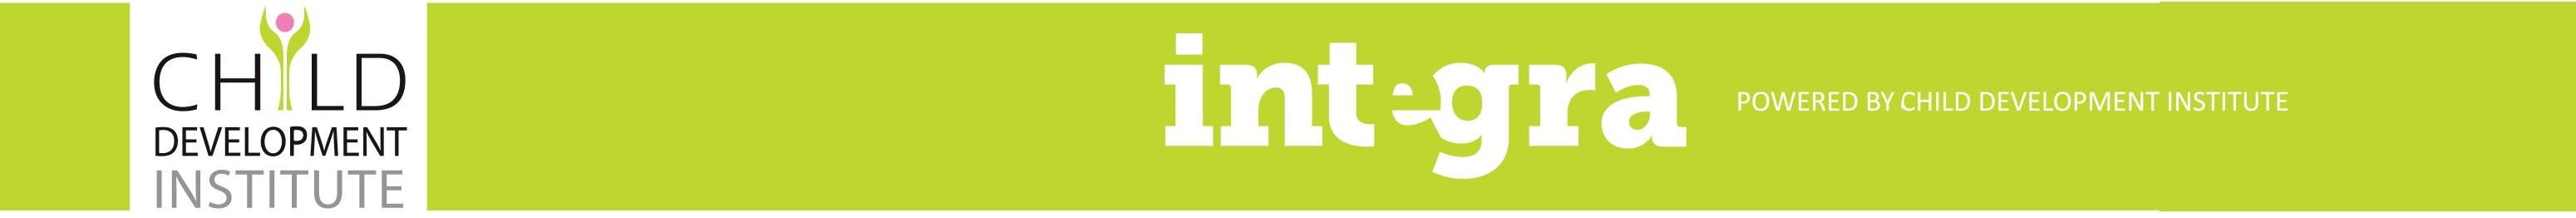 CDI and Integra's logo